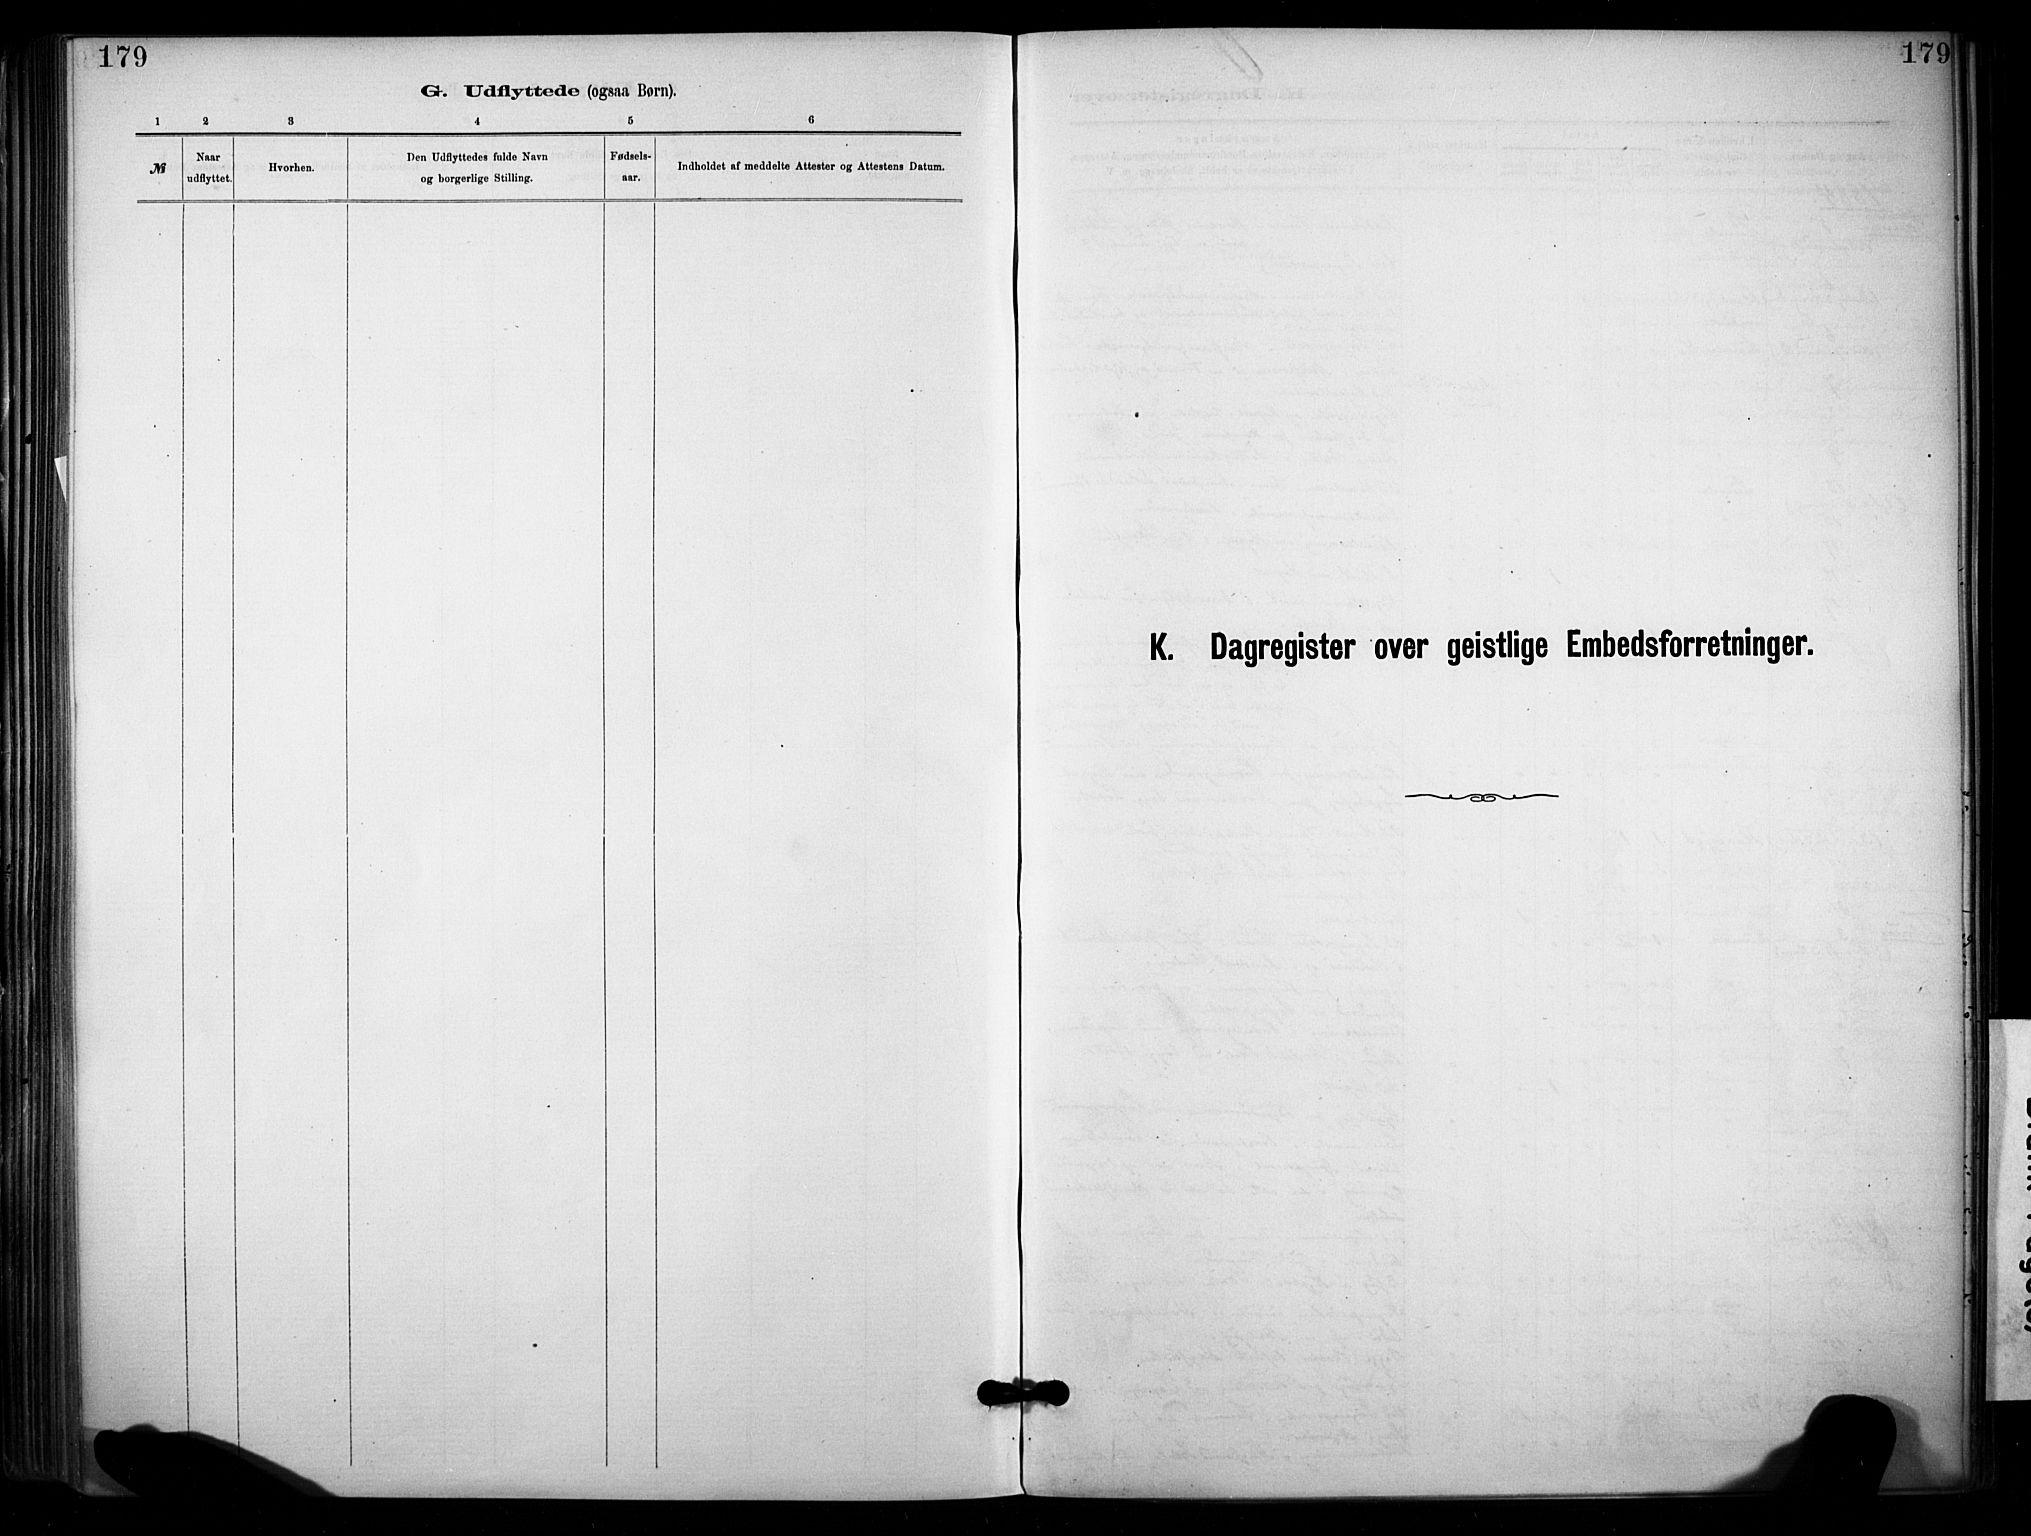 SAKO, Lunde kirkebøker, F/Fa/L0002: Ministerialbok nr. I 2, 1884-1892, s. 179